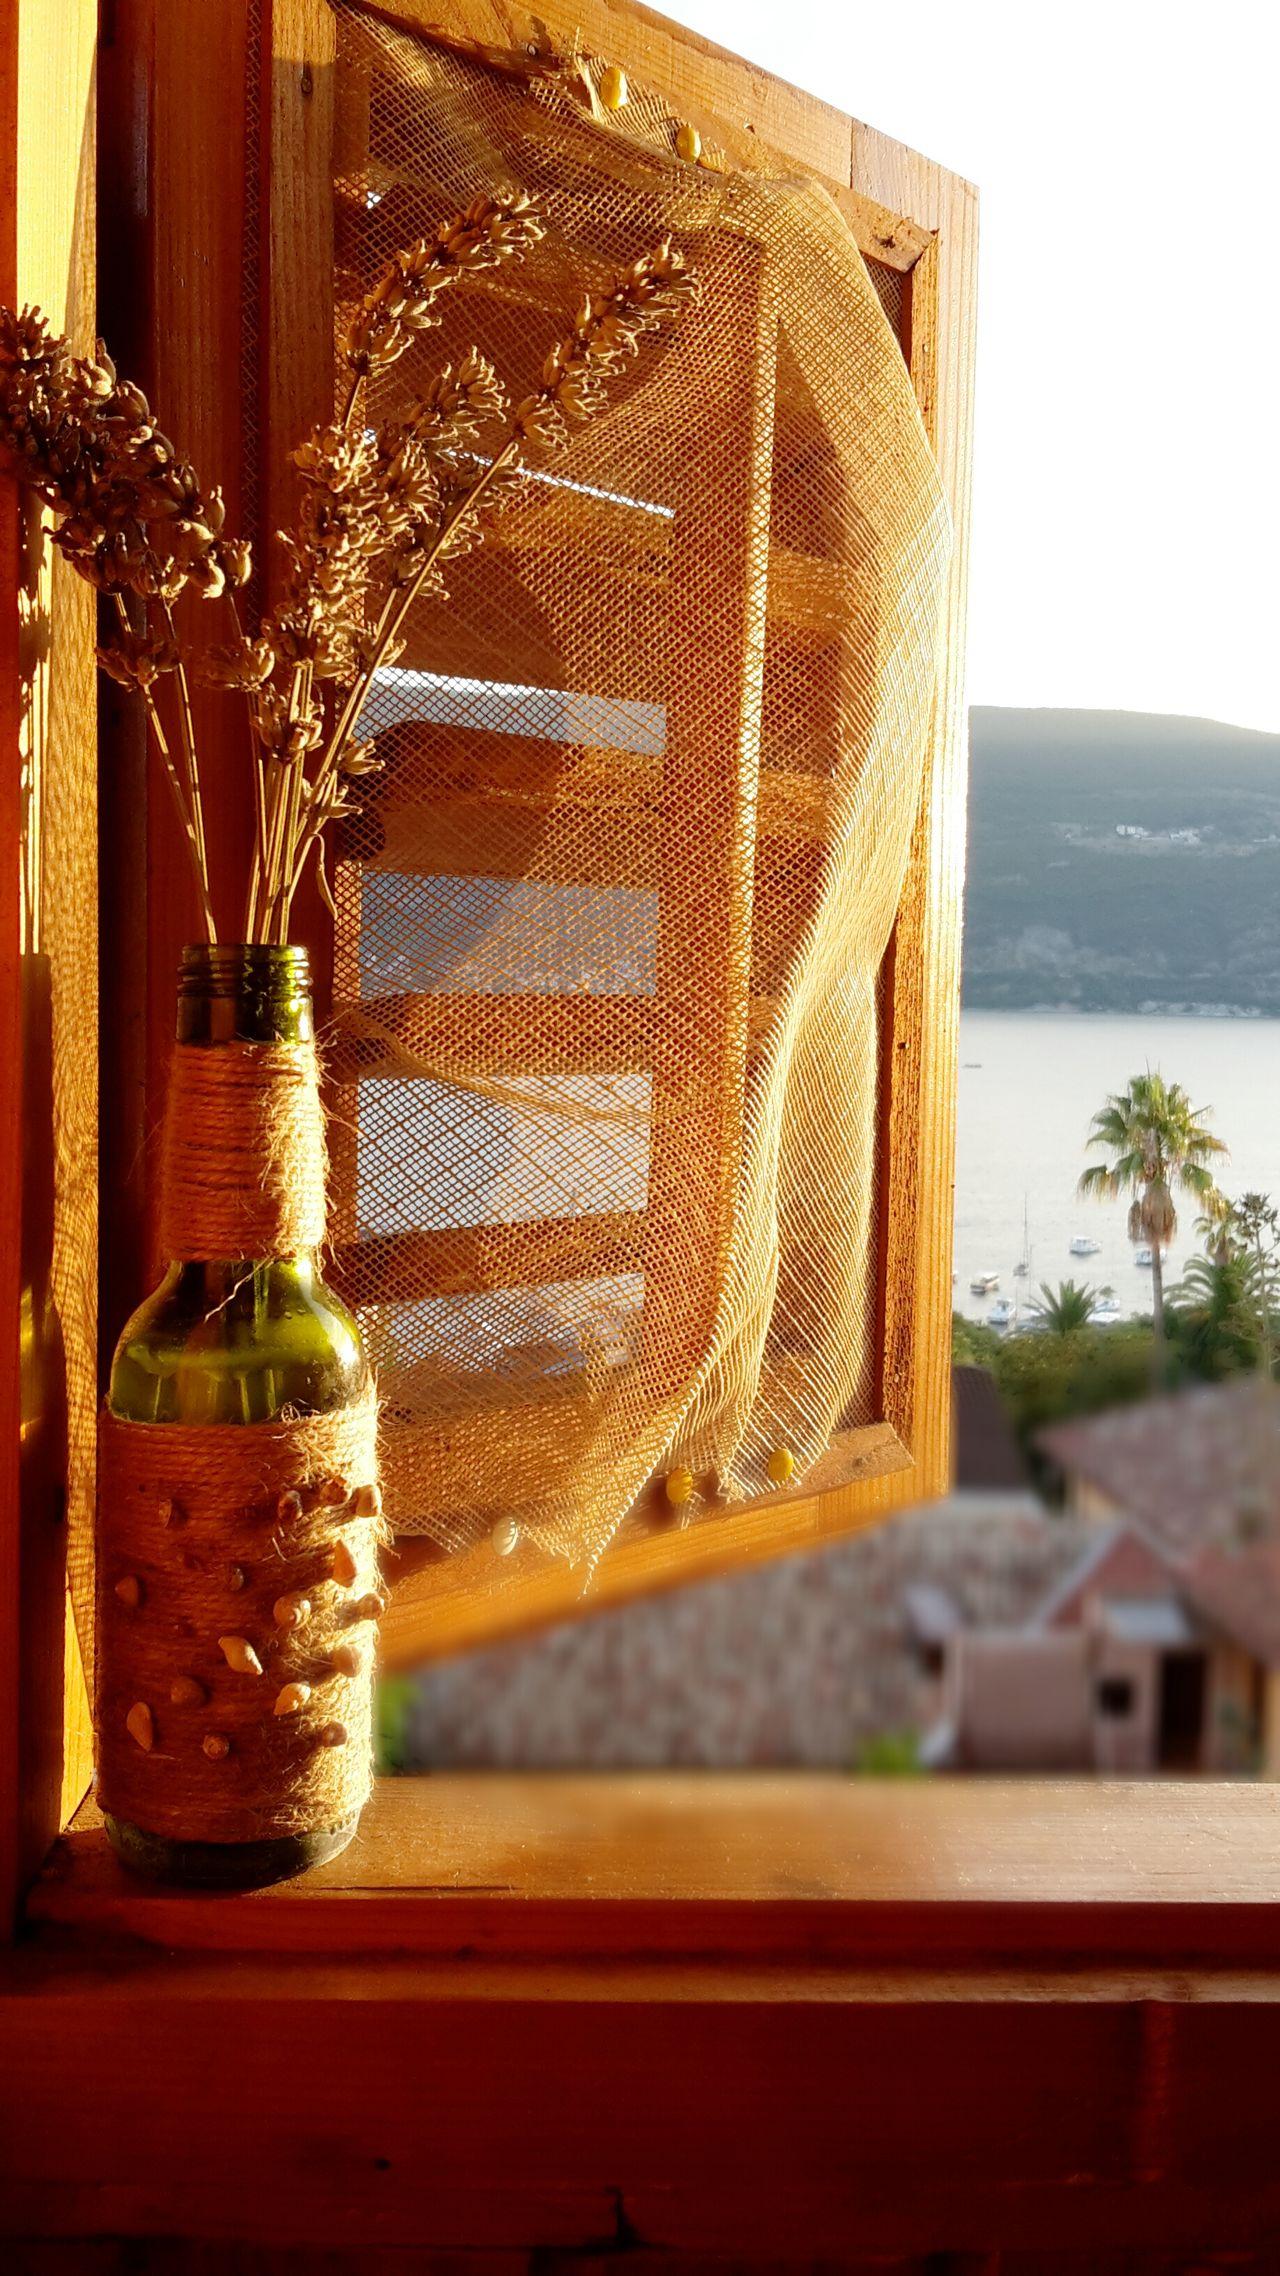 Handmade Seastyle Seashells Winebotttle Window View Seaside Lavander